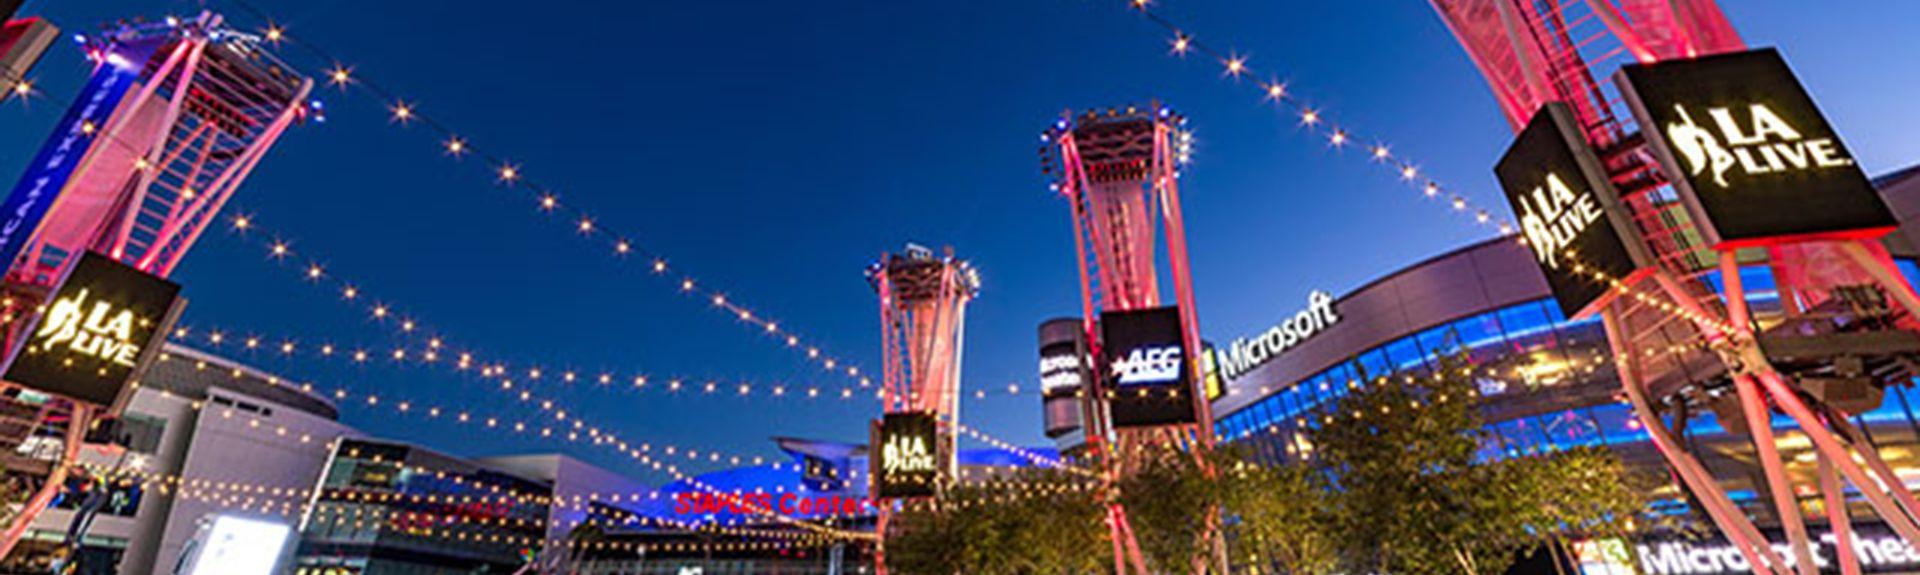 Fashion District, Los Angeles, Californië, Verenigde Staten